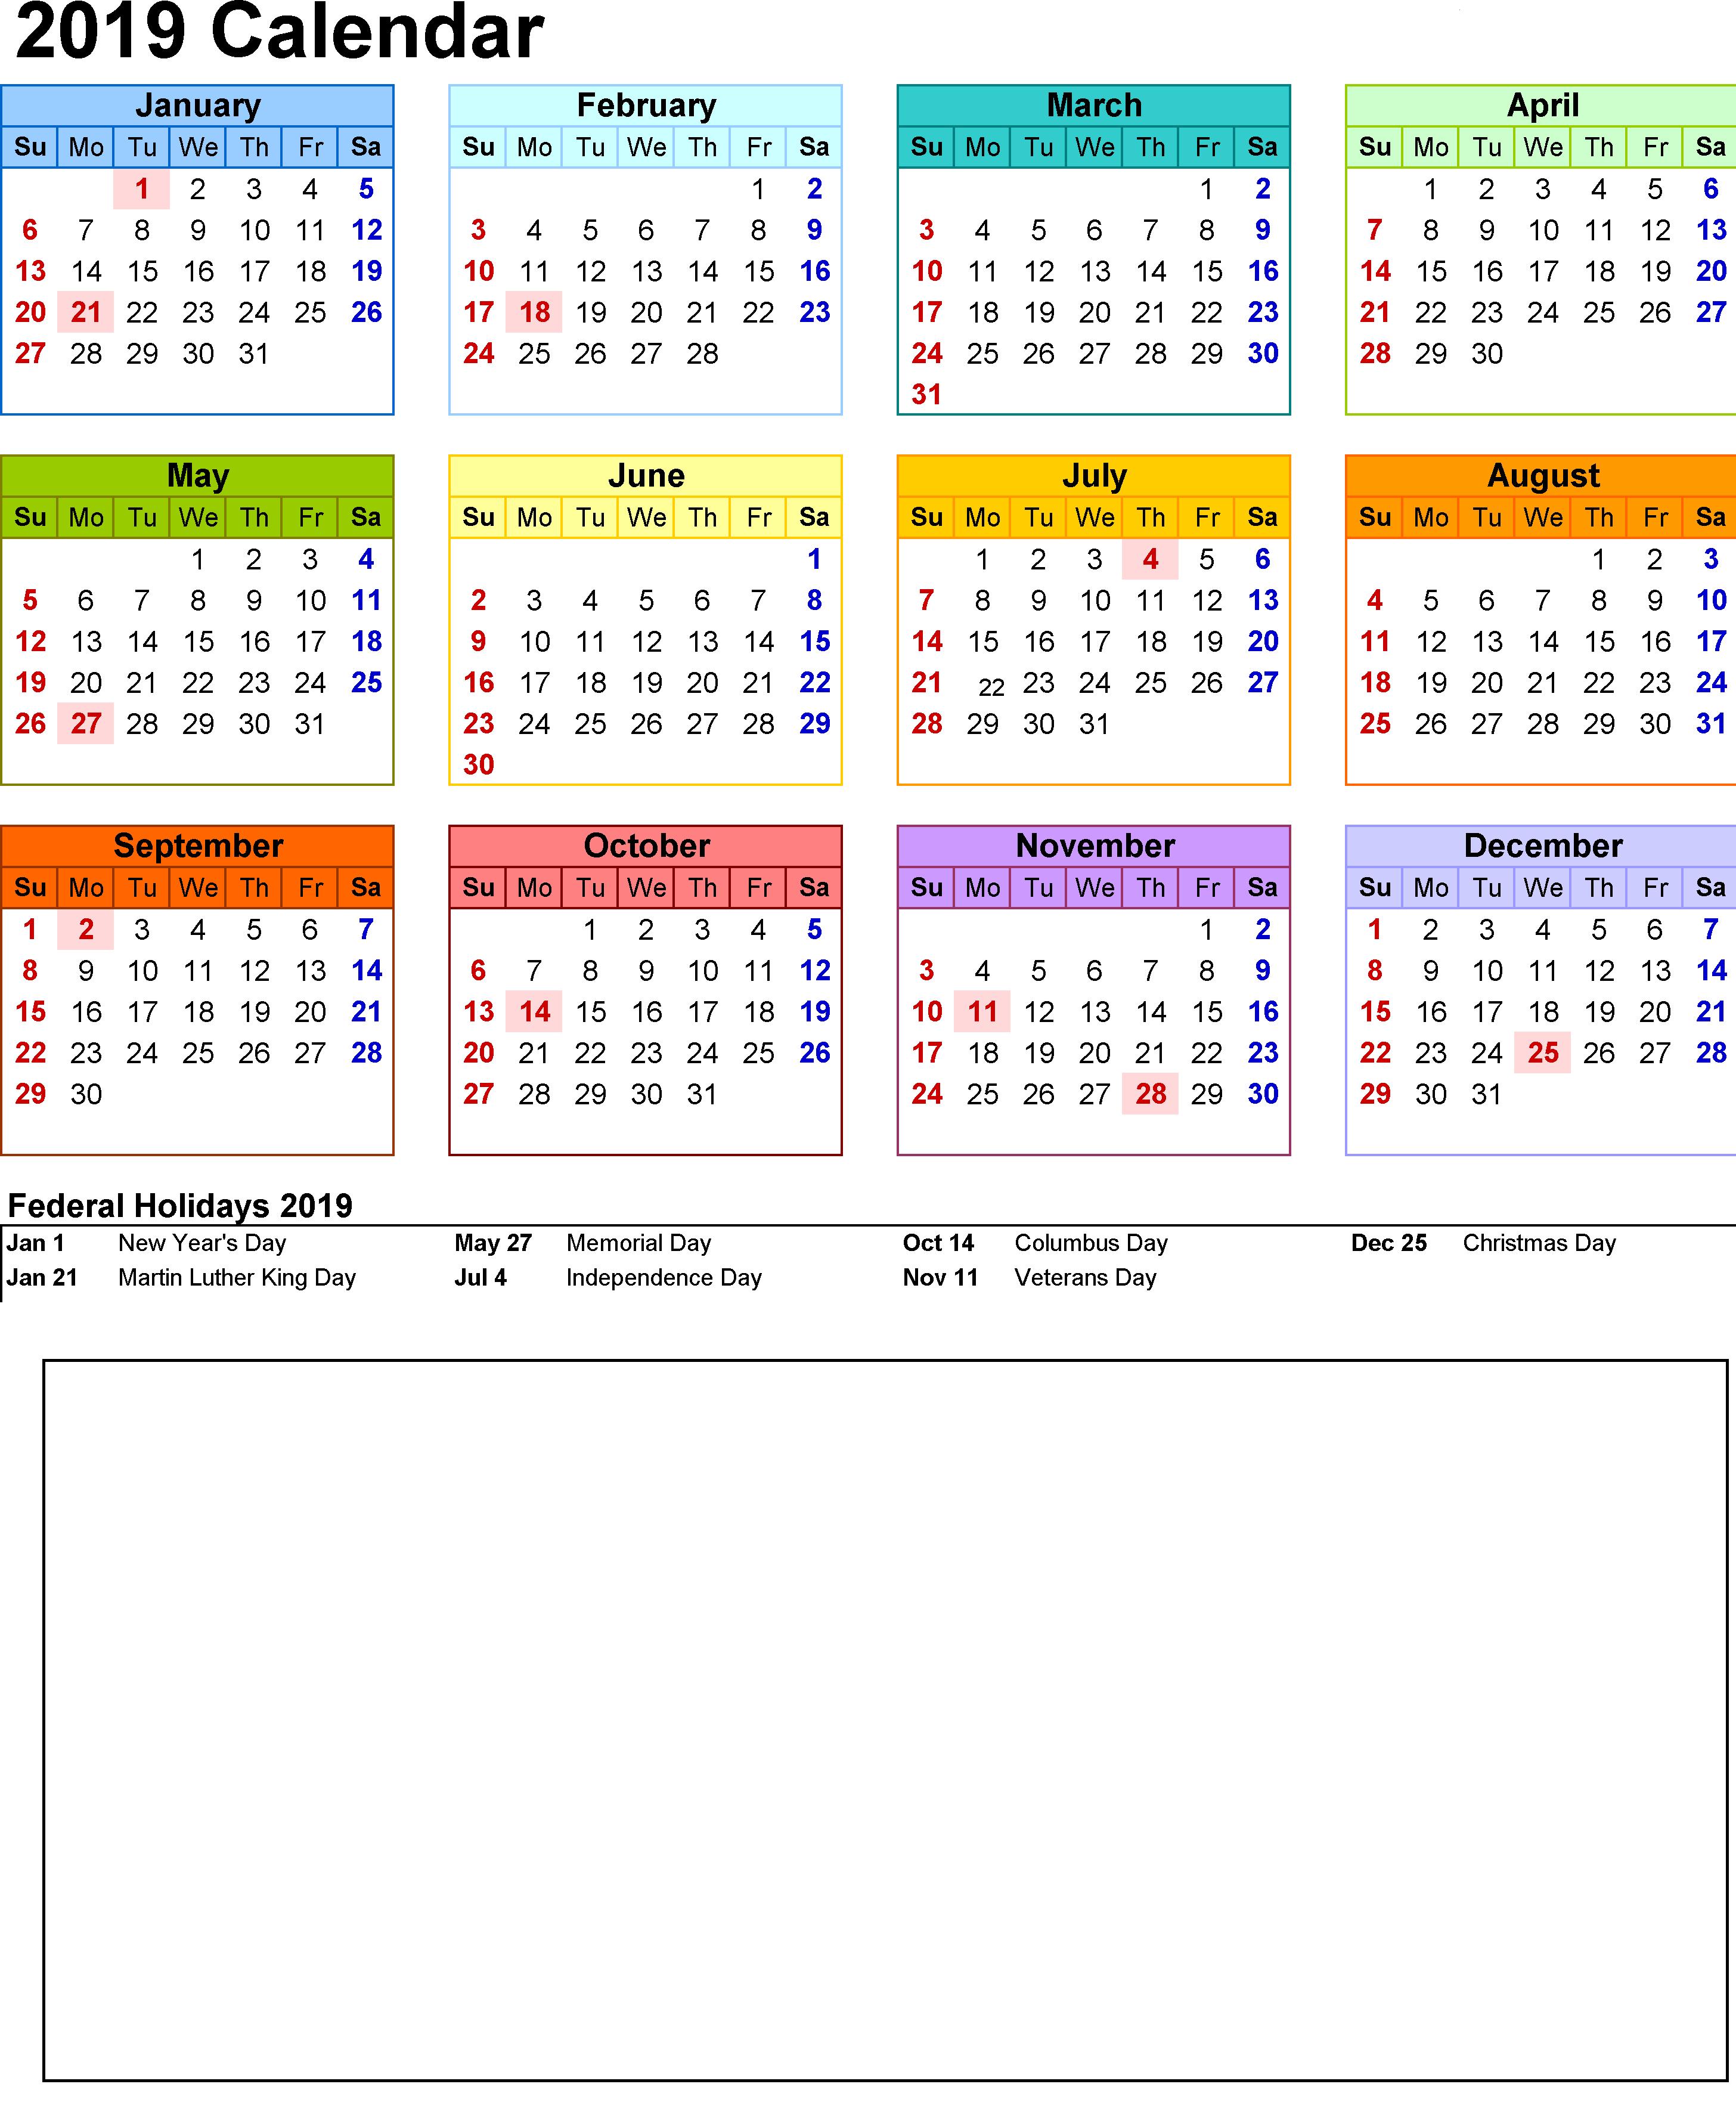 2019 Holiday Calendar   2019 Holiday Calendar In 2019   Federal Calendar 2019 With Federal Holidays